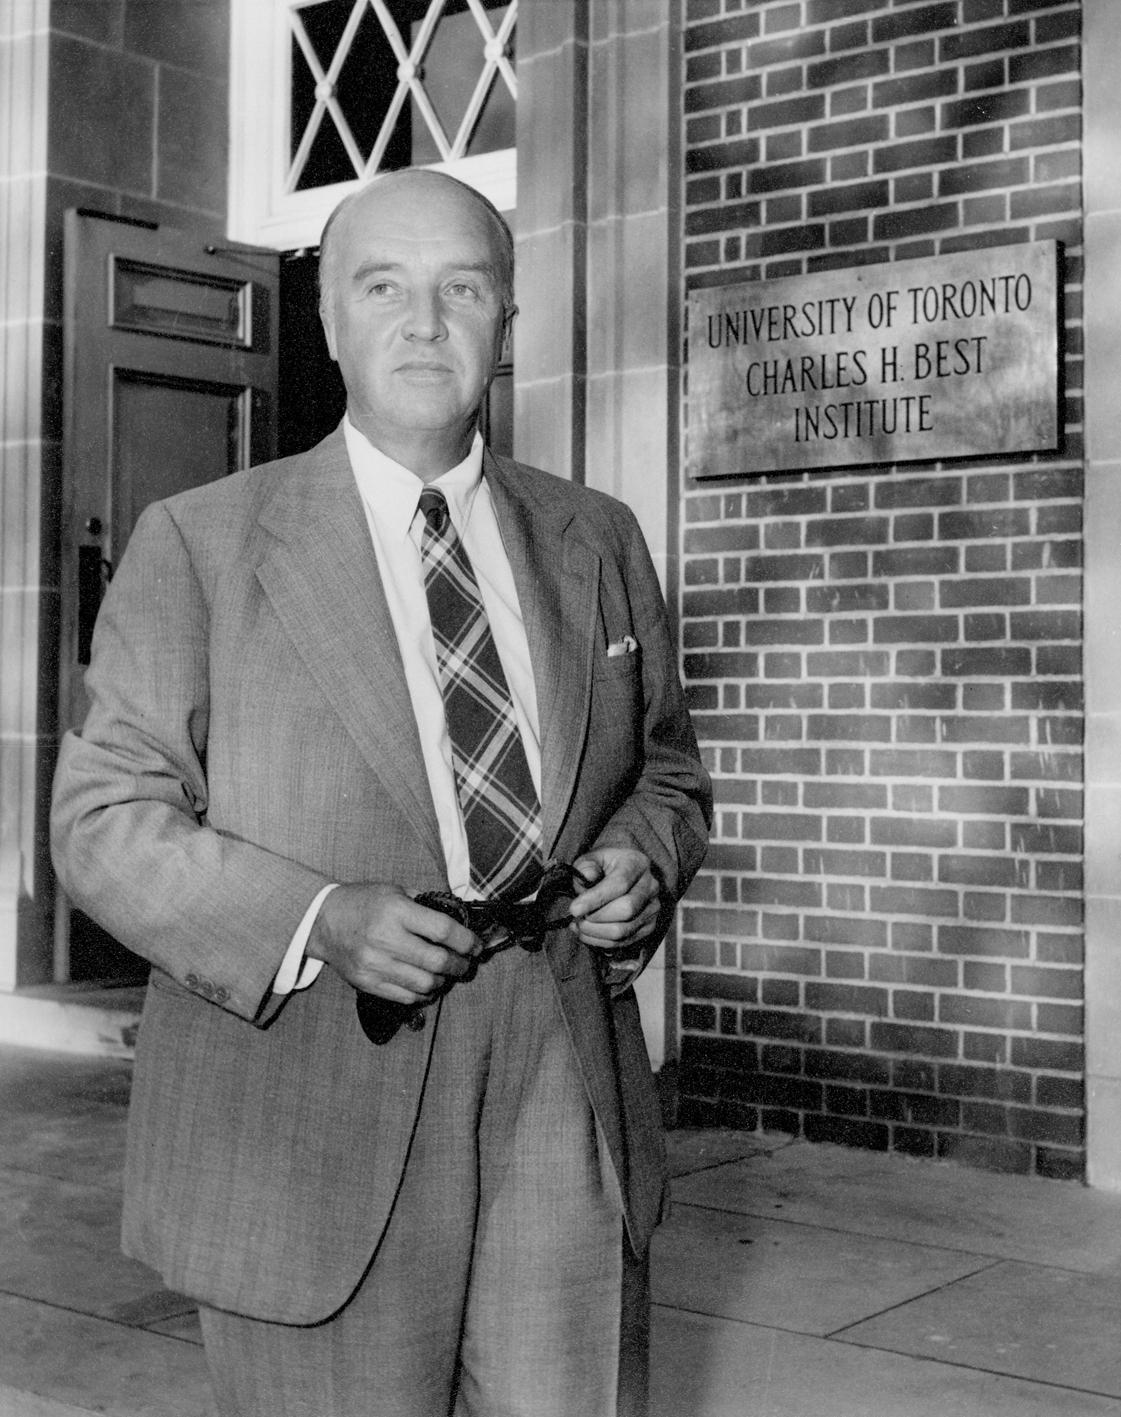 Dr. Charles H. Best